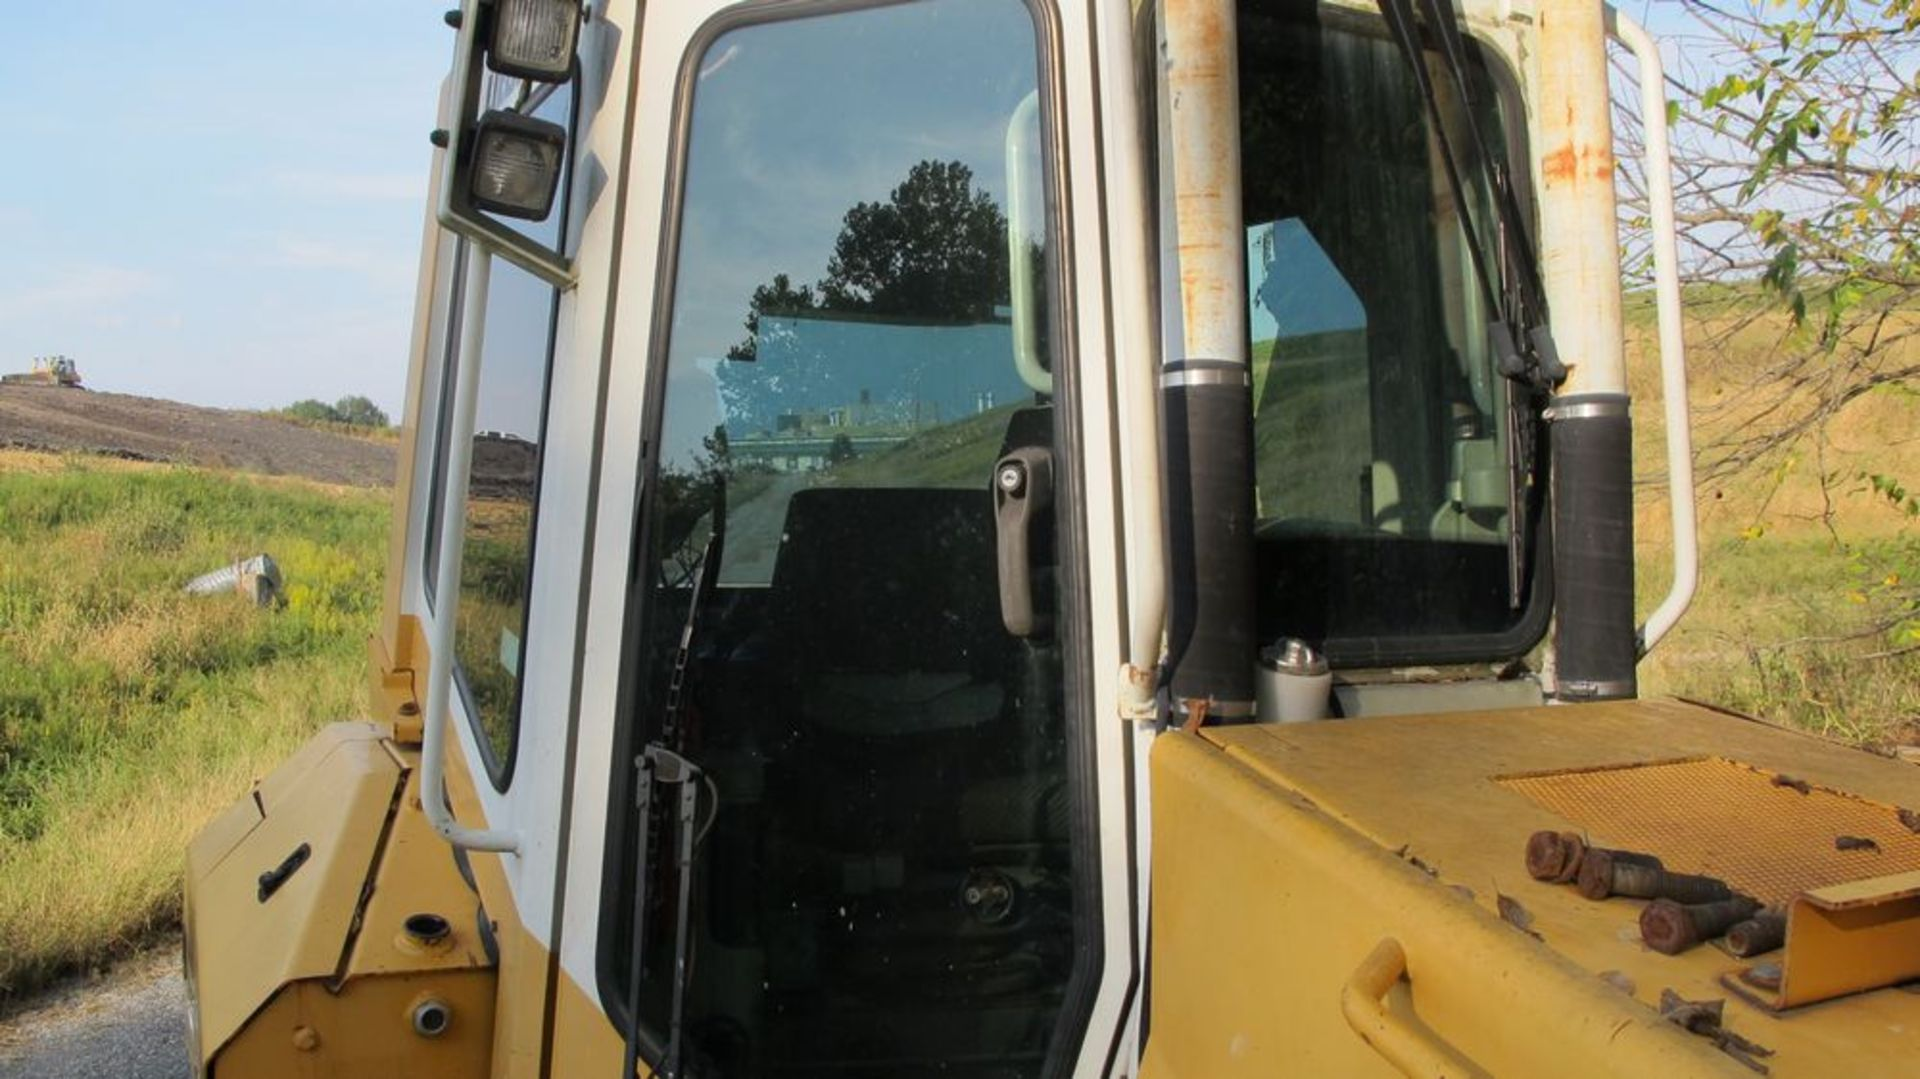 Lot 3 - LIEBHERR 734 DOZER, PR 734LGP, S/N 726-6809 (NEEDS REPAIR) CLIMATE CONTROLLED CAB, STEREO (LAND FILL